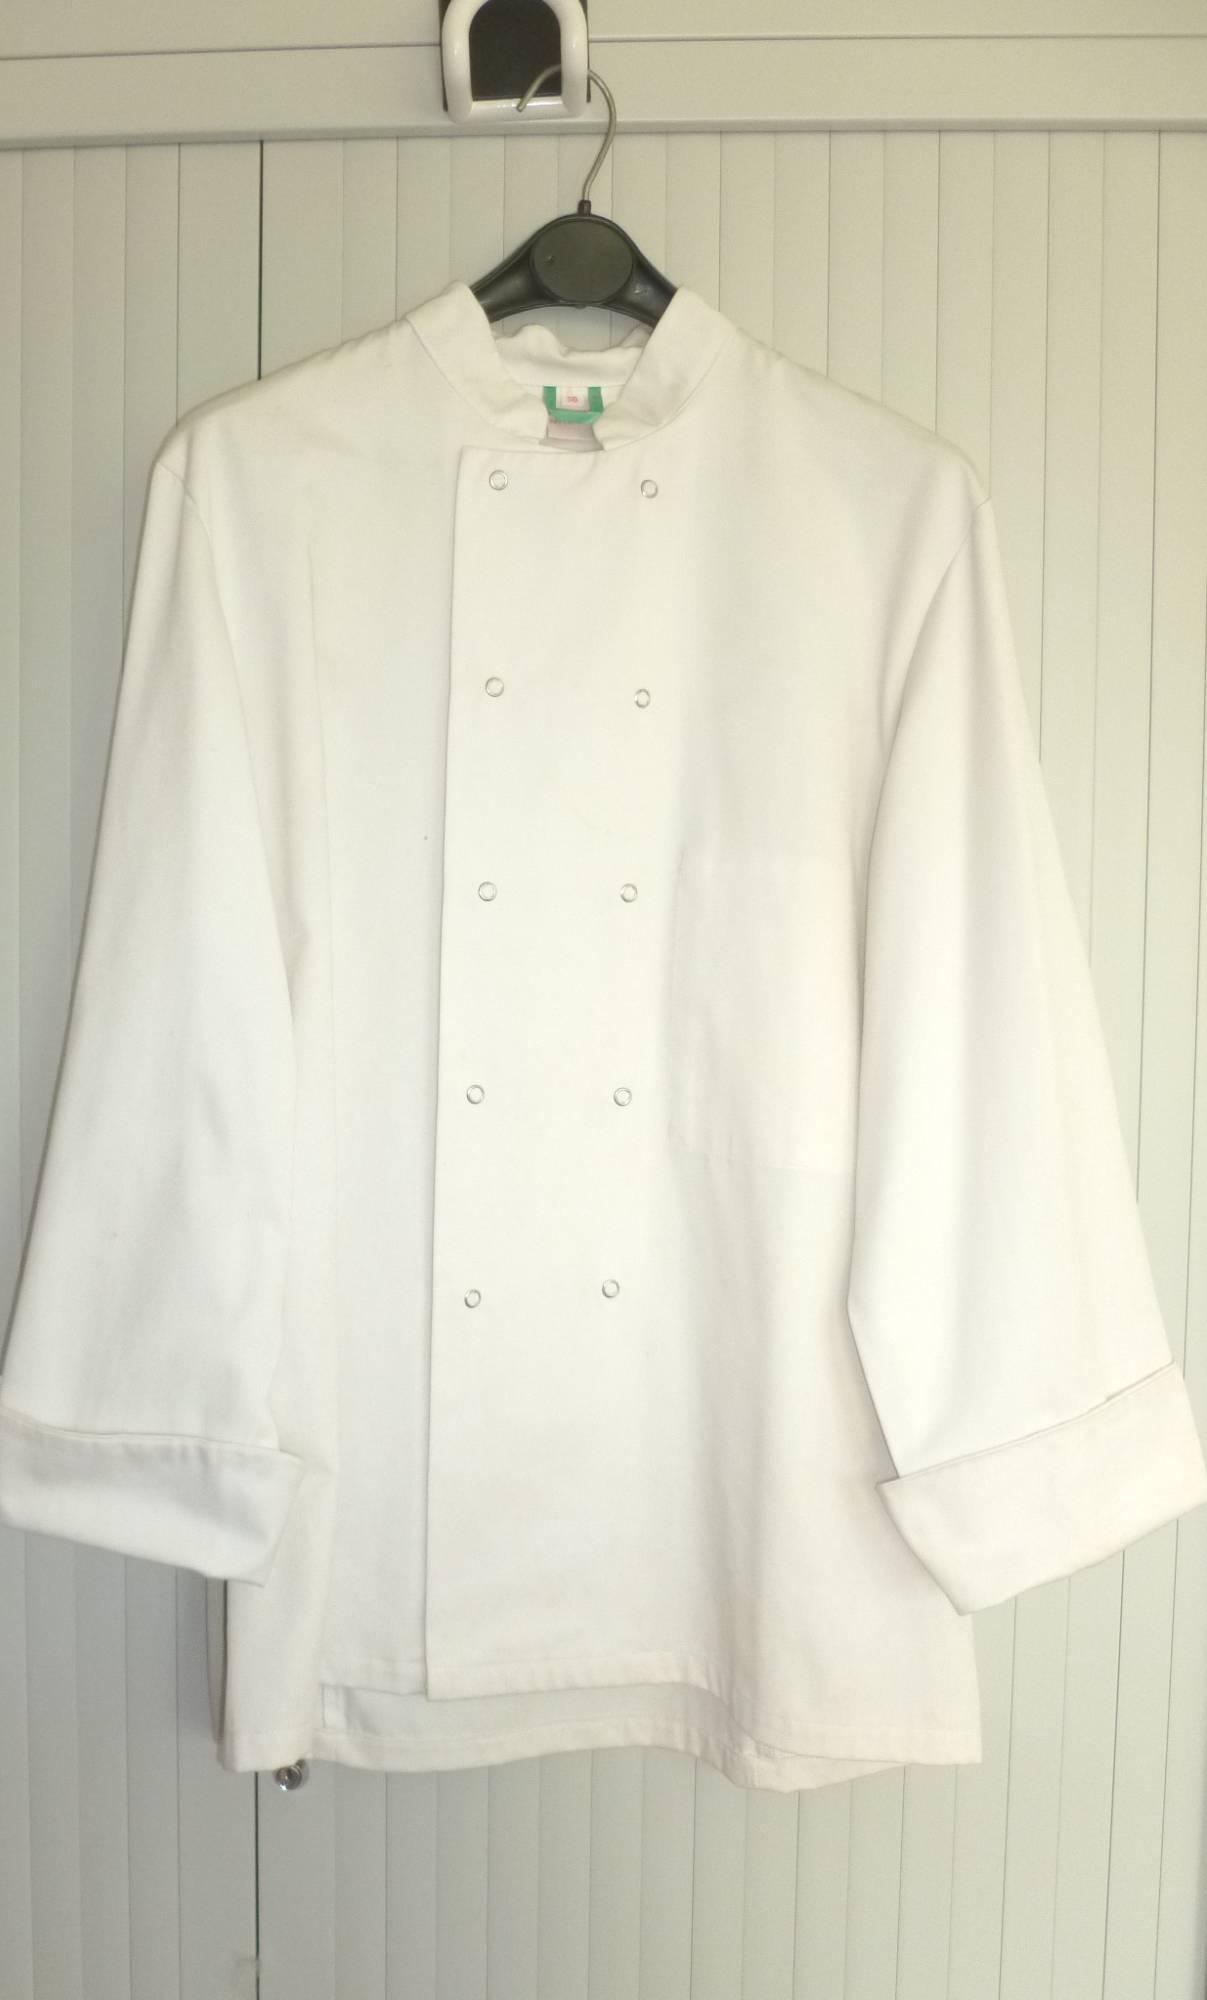 Dguisement veste de cuisinier h1 ref v11033 for Cuisinier occasion